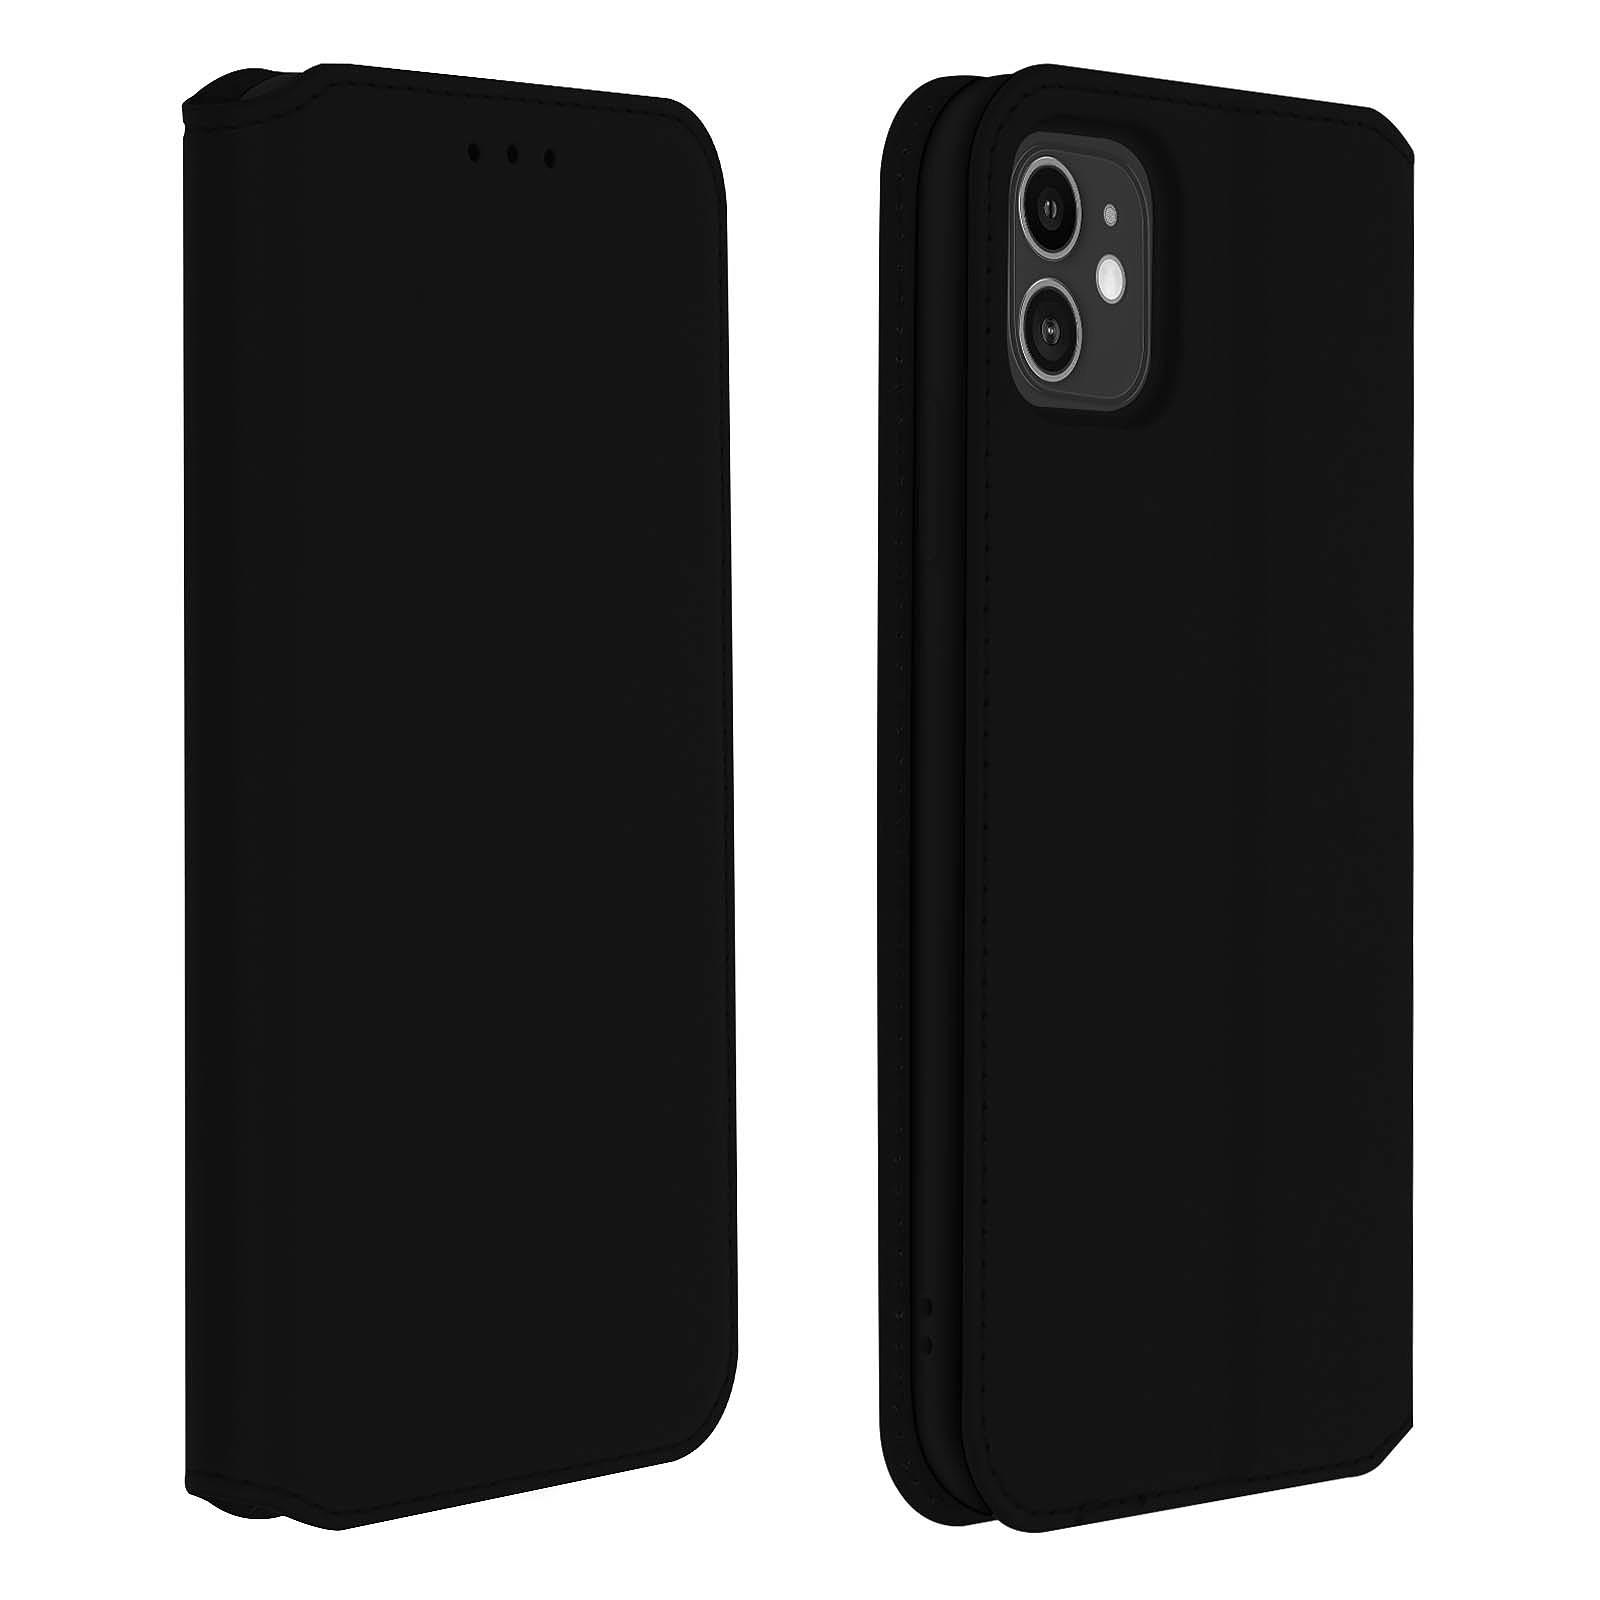 Avizar Etui folio Noir Éco-cuir pour Apple iPhone 11